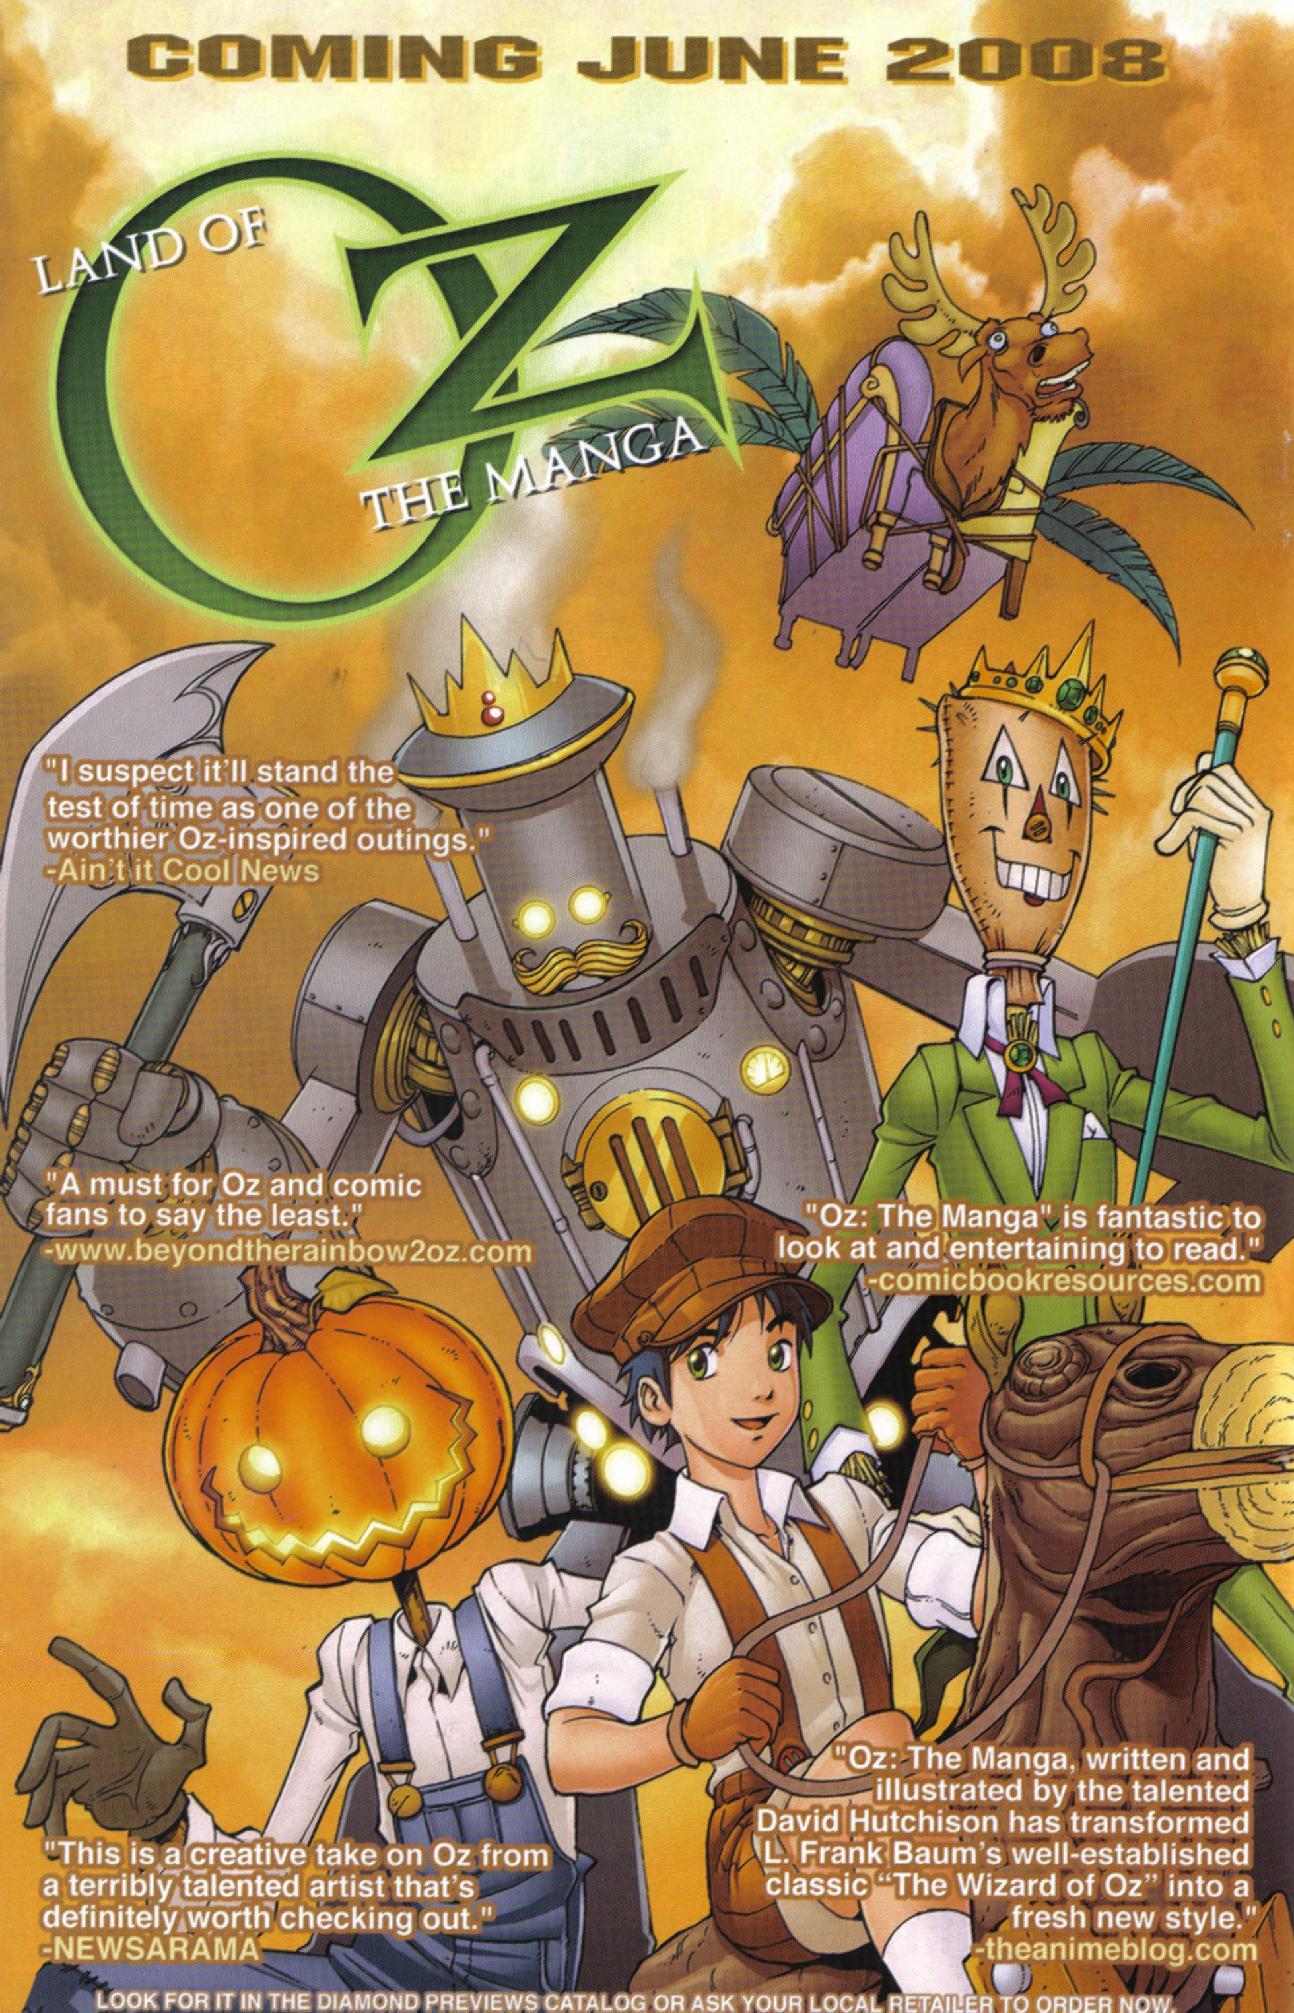 Read online Pirates vs. Ninjas: Global Harming comic -  Issue # Full - 32